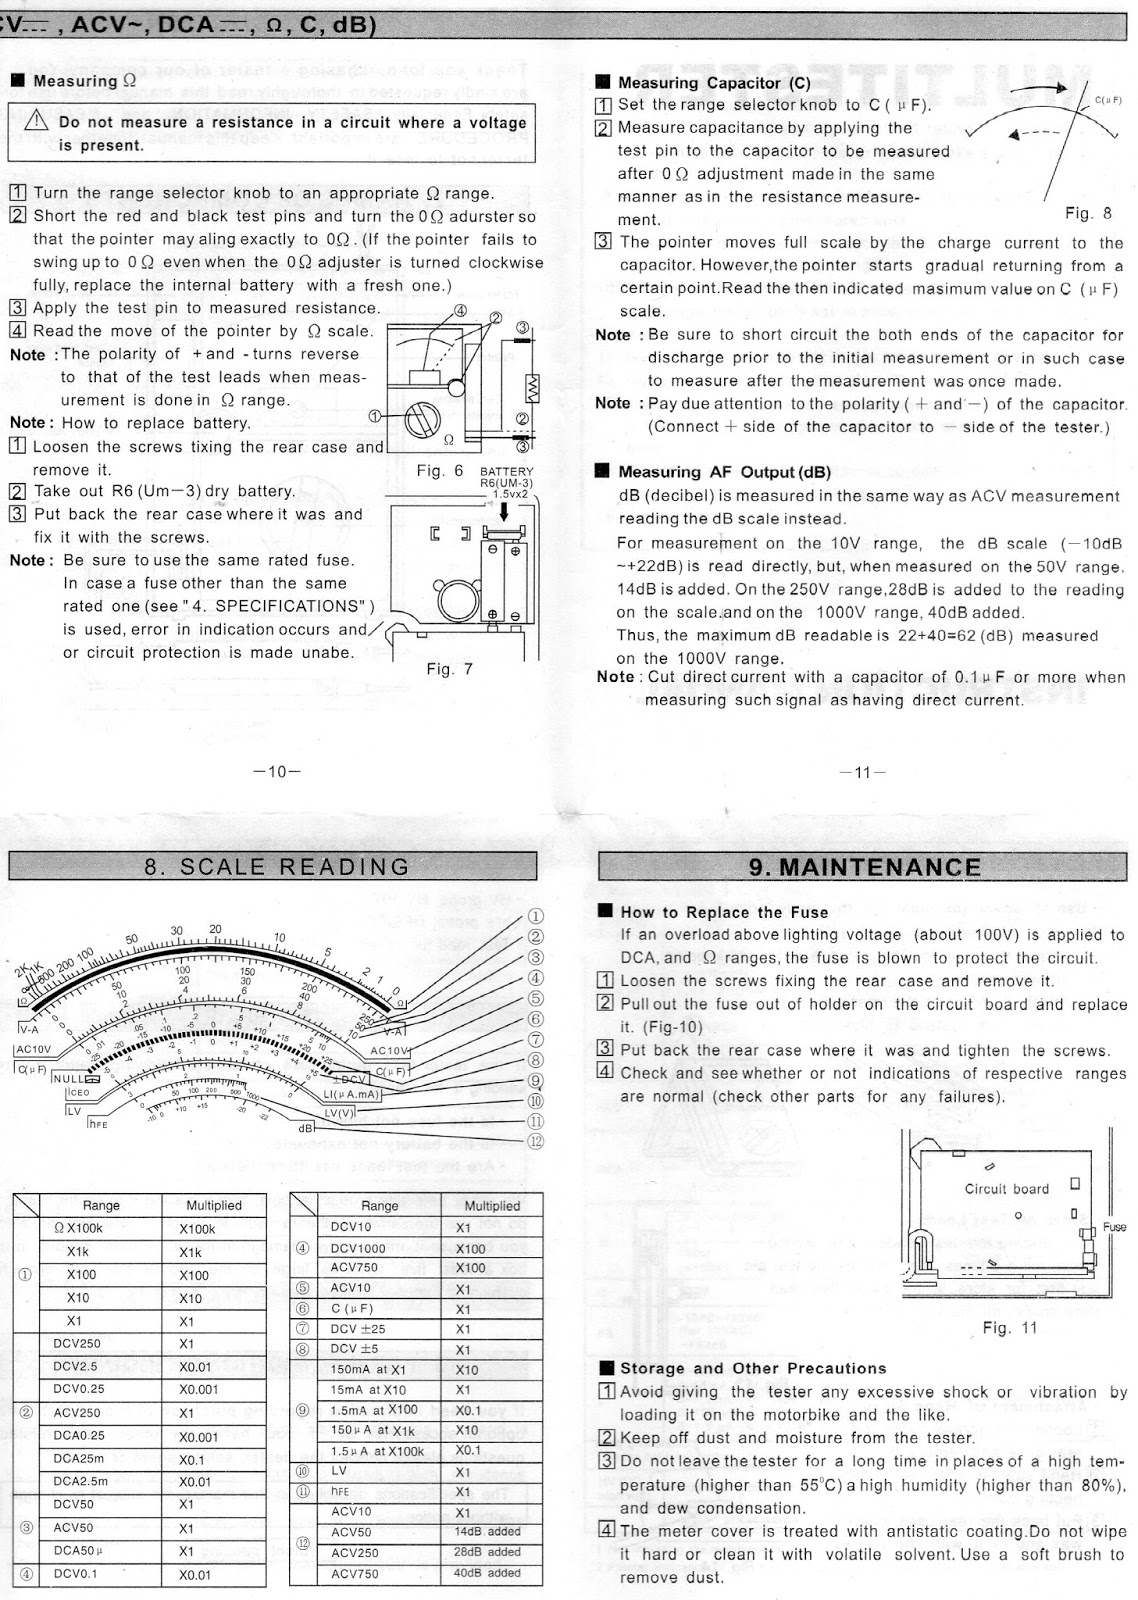 empire builder digitrax wiring diagram [ 1138 x 1600 Pixel ]